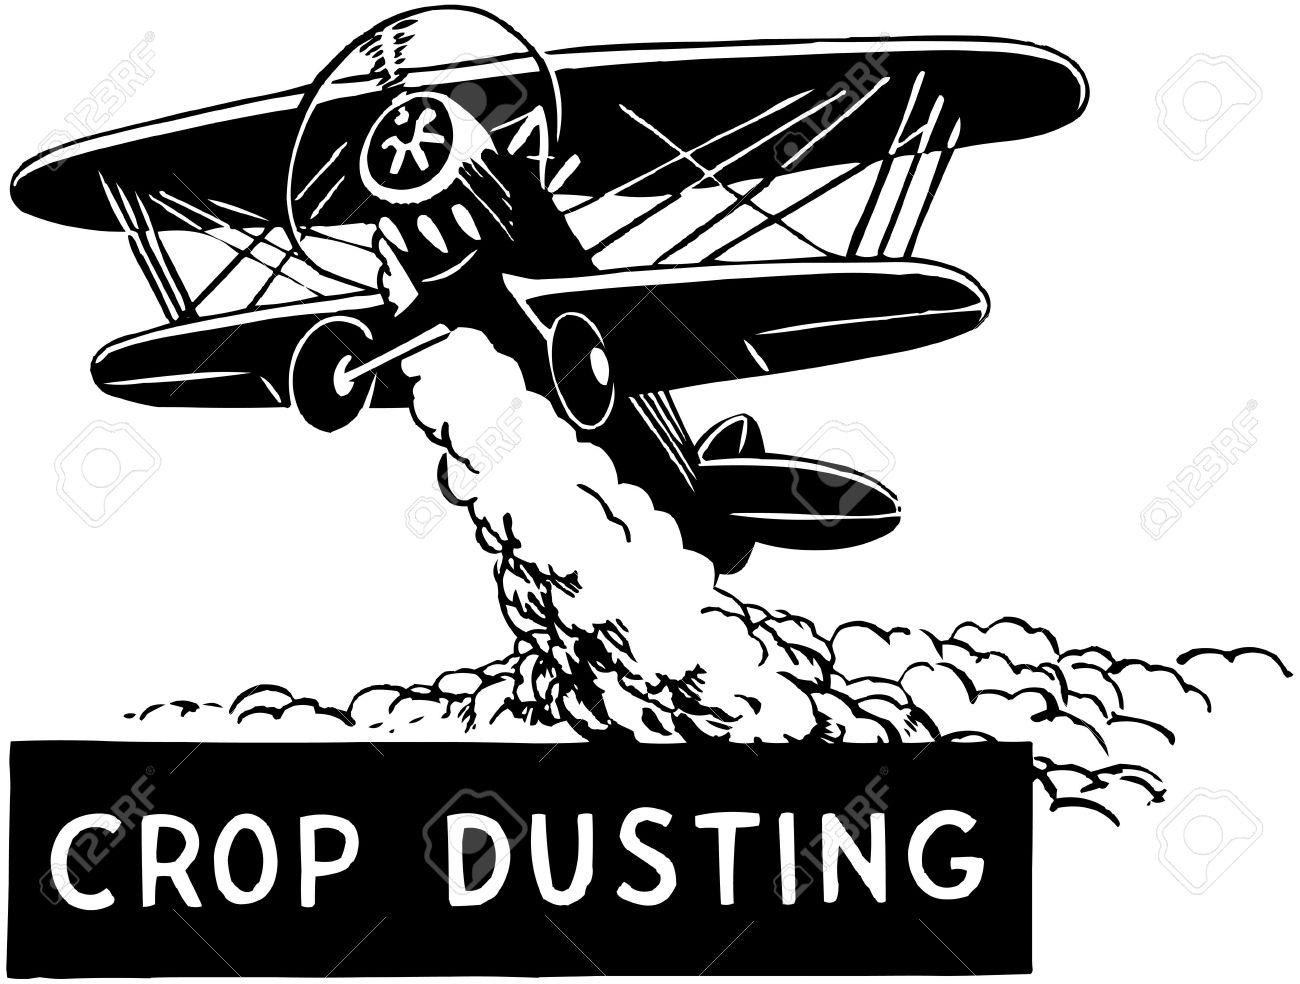 1000+ images about Crop Dusting Clip Art on Pinterest.